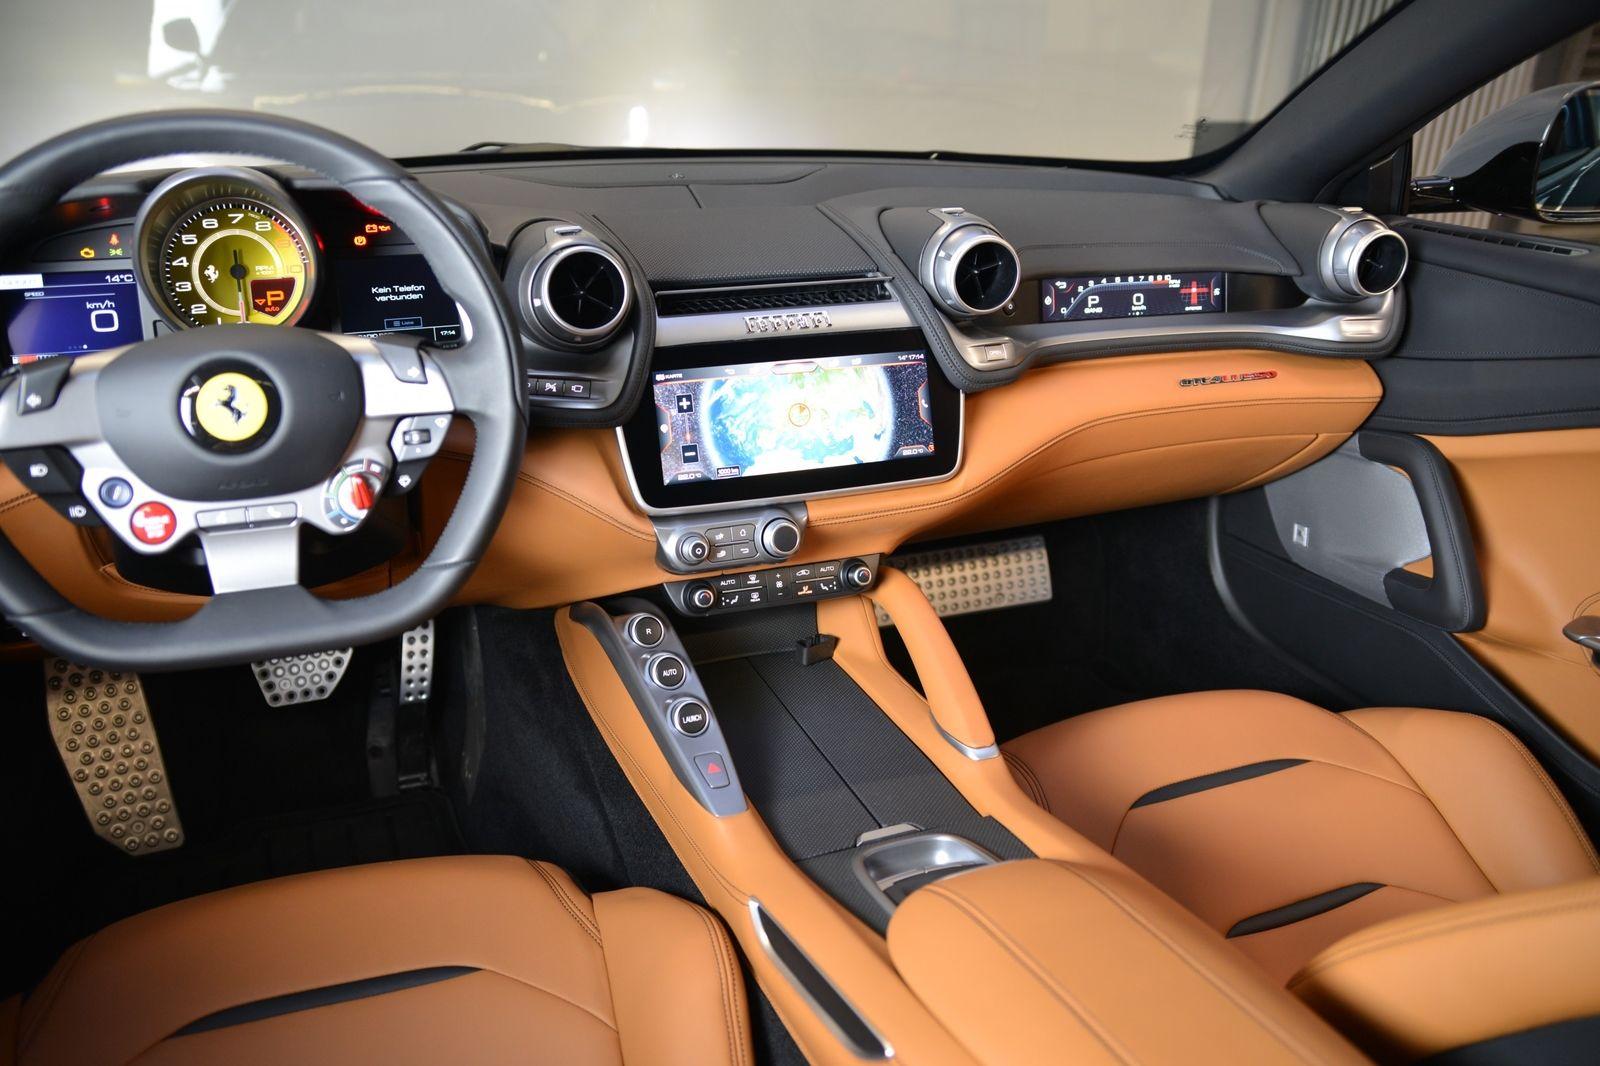 Ferrari Gtc4lusso Full Novitec Luxury Pulse Cars Germany For Sale On Luxurypulse